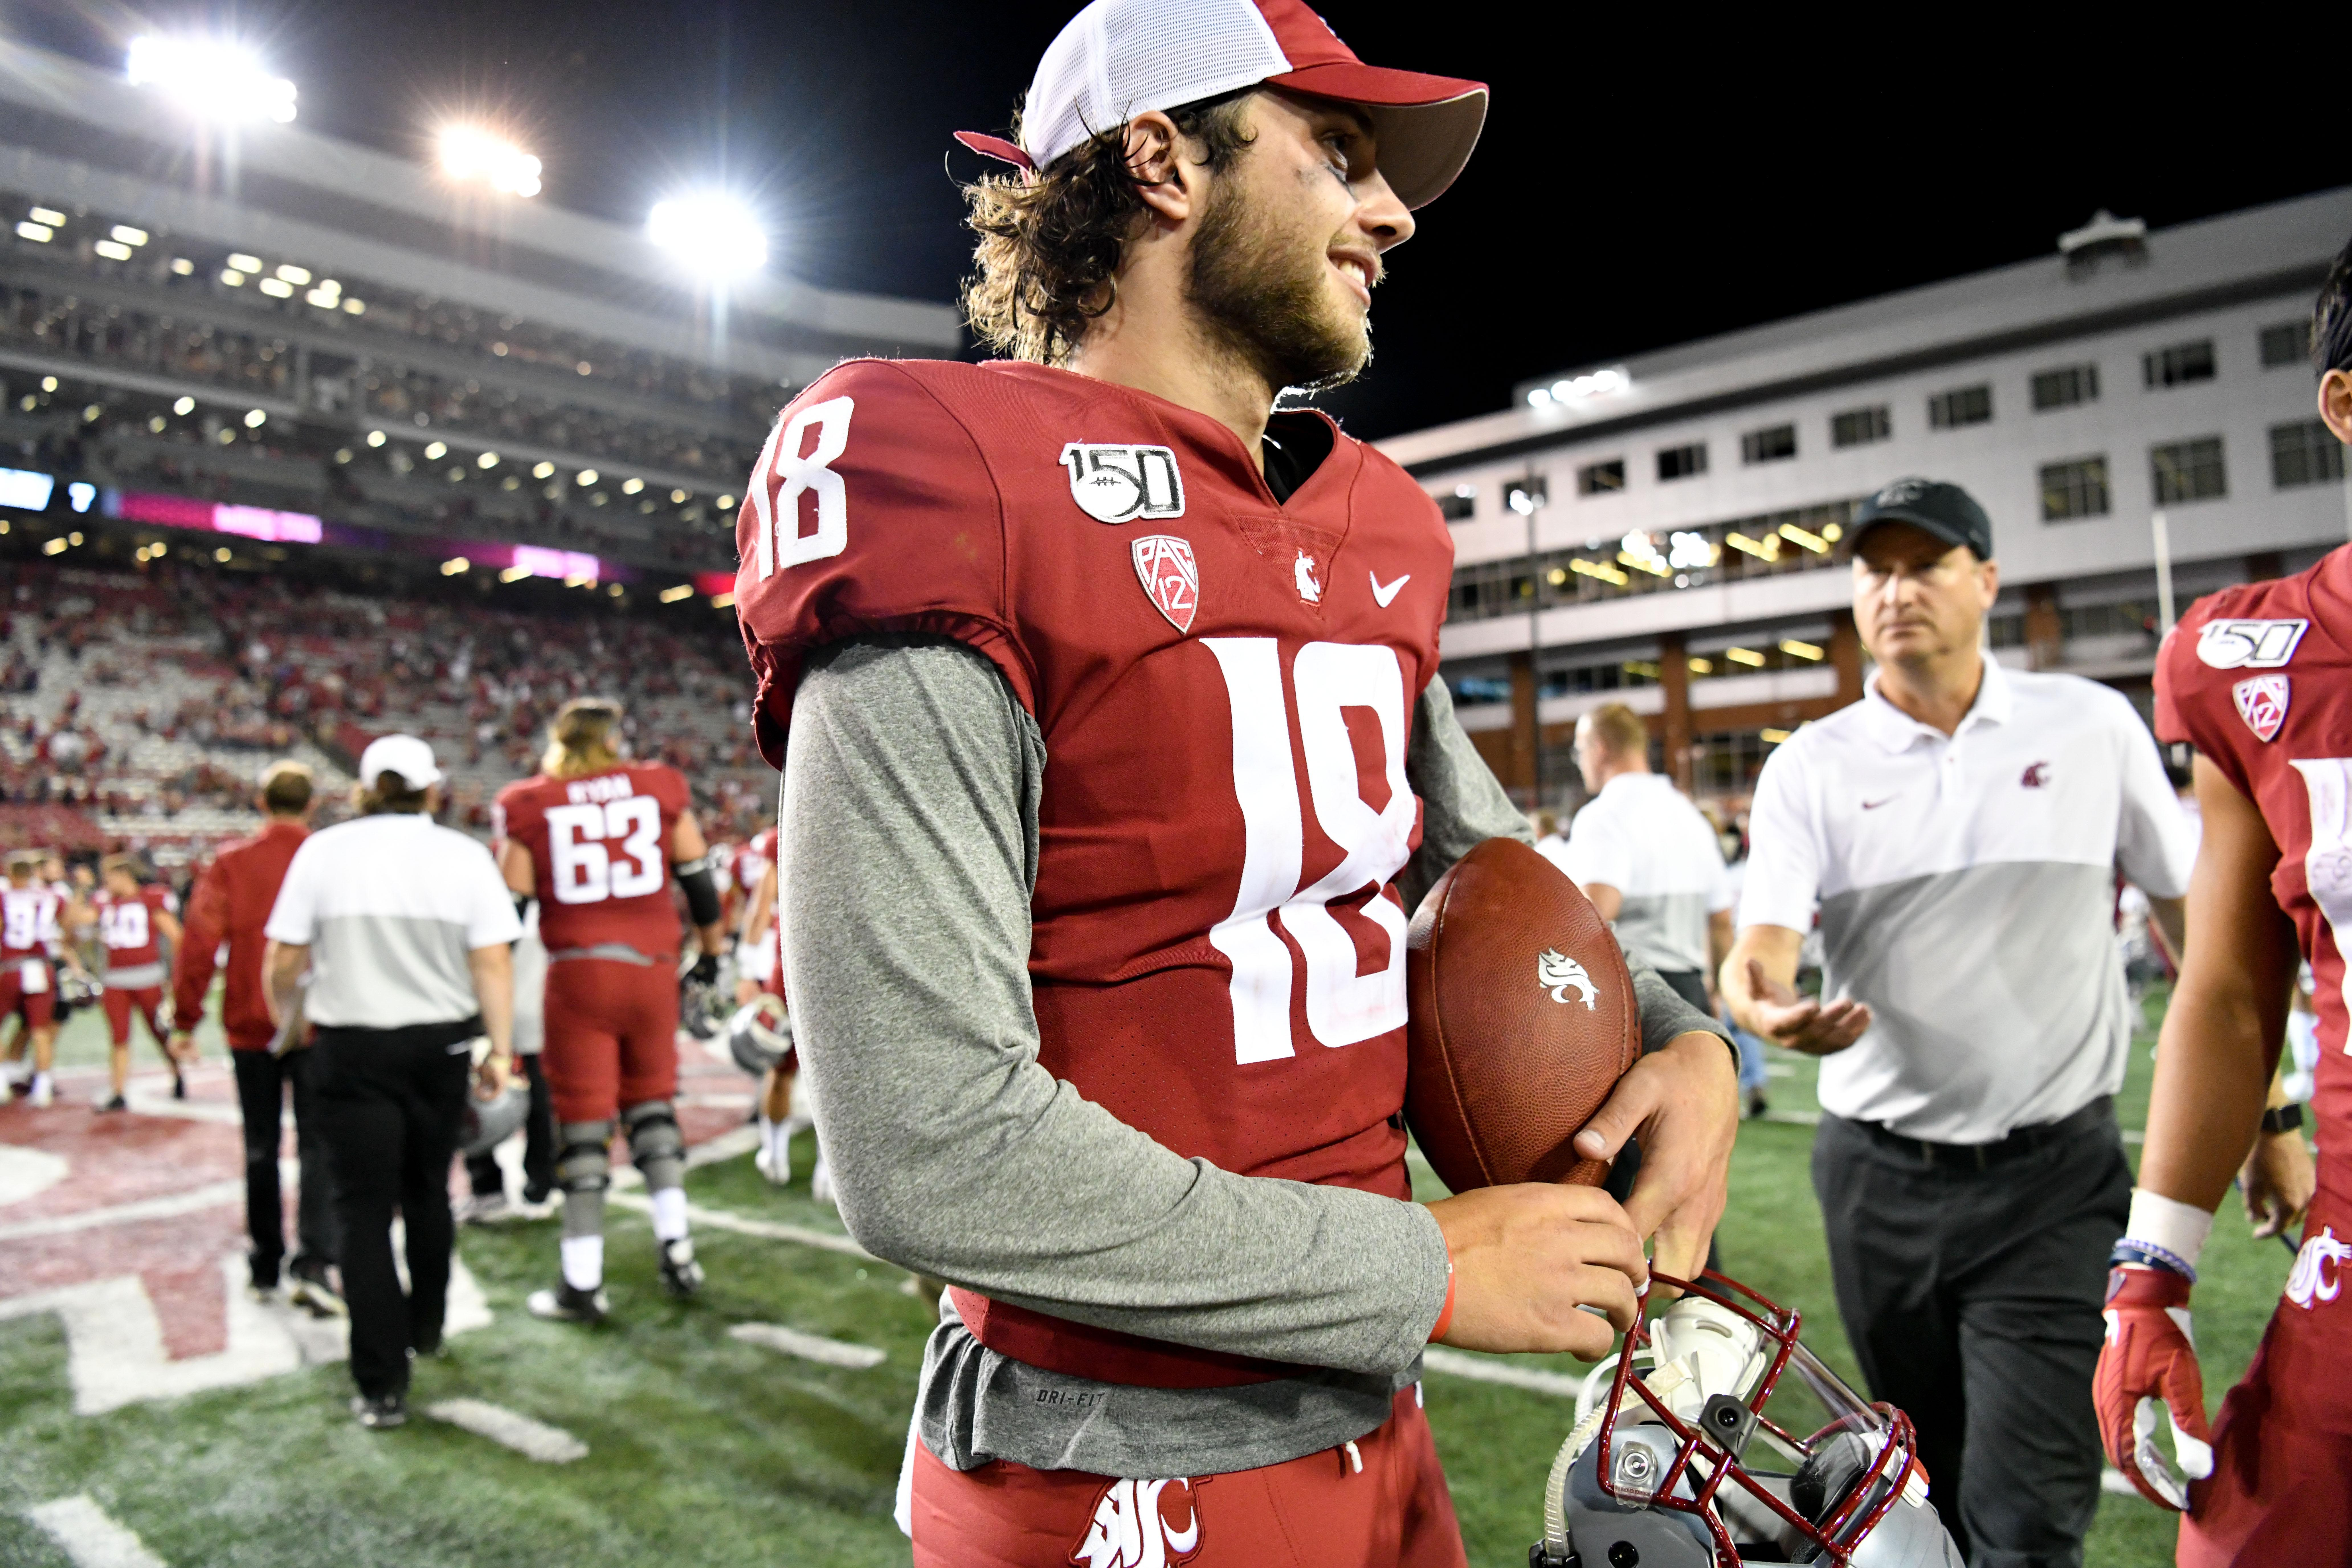 A Grip on Sports: Washington State rolls, Eastern and Idaho